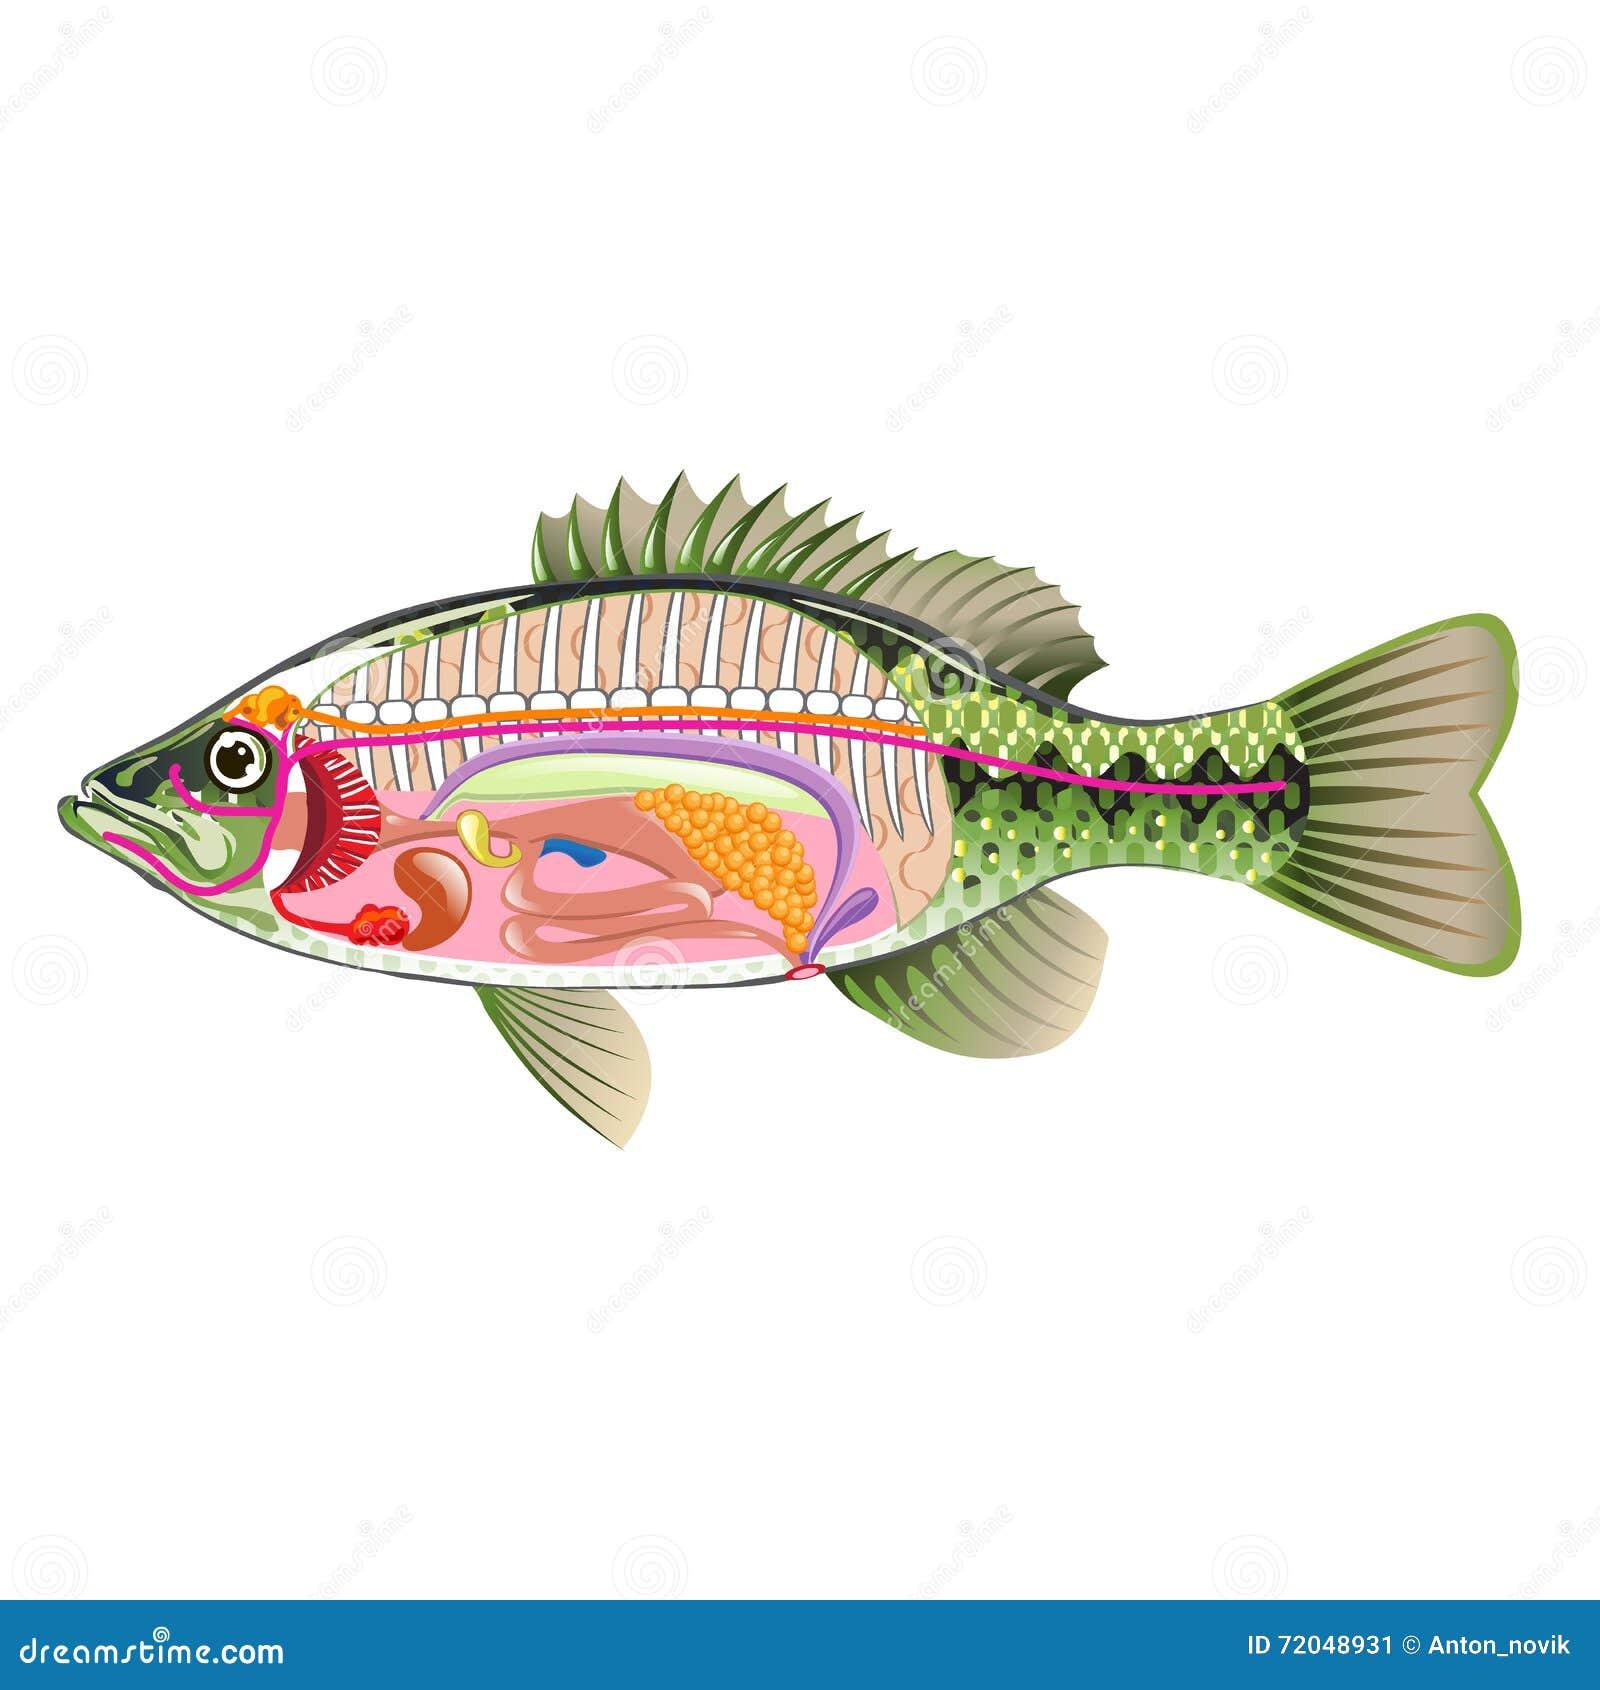 Fish Internal Organs Vector Art Diagram Anatomy Without